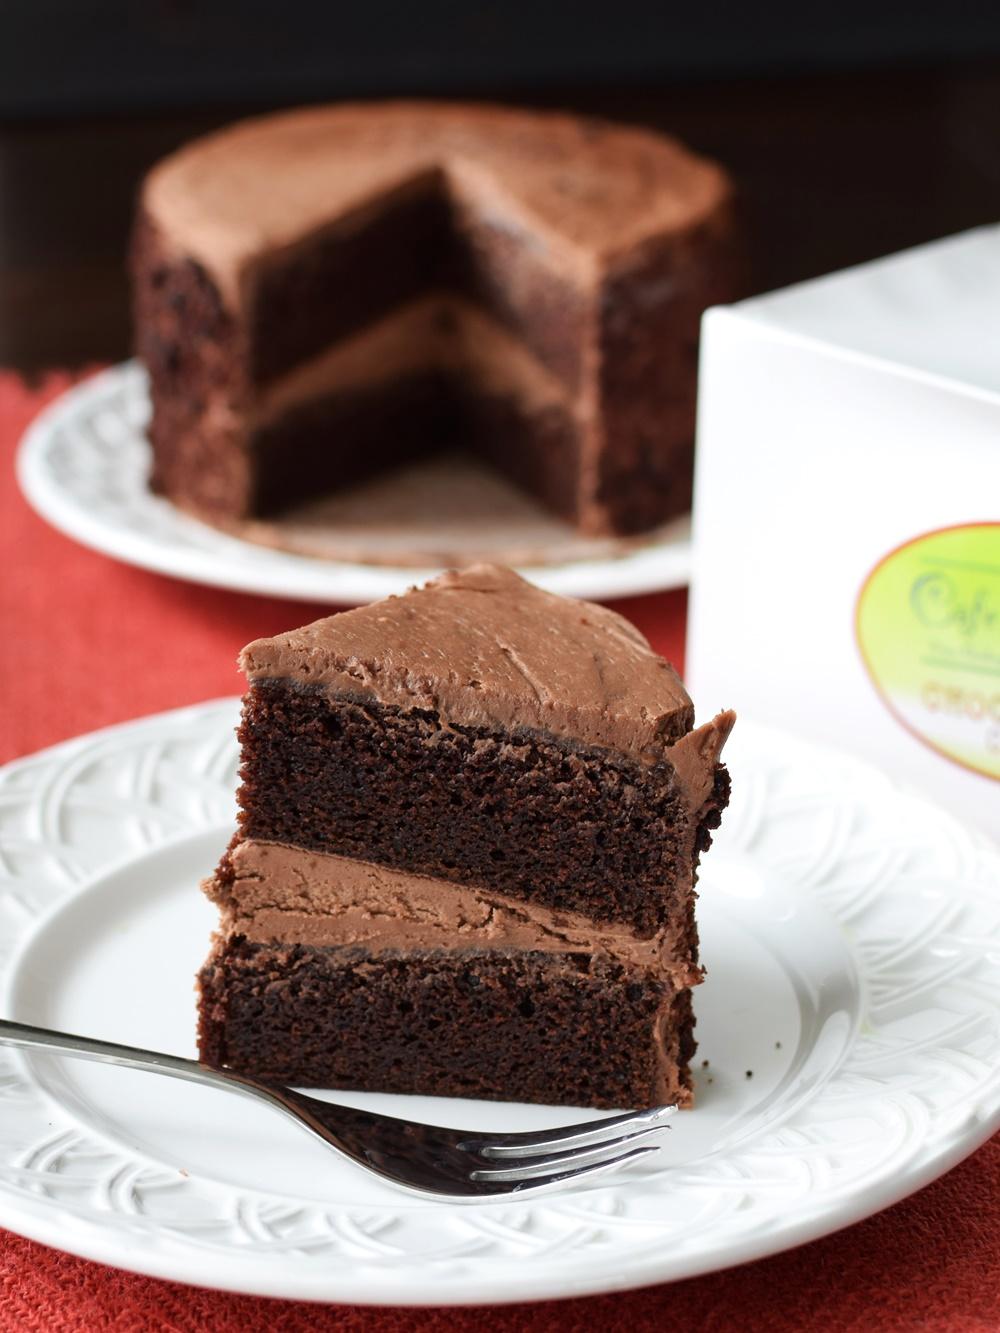 Cafe Indigo Vegan Goodness Layer Cakes - Amazingly dairy-free & egg-free! (chocolate cake pictured)